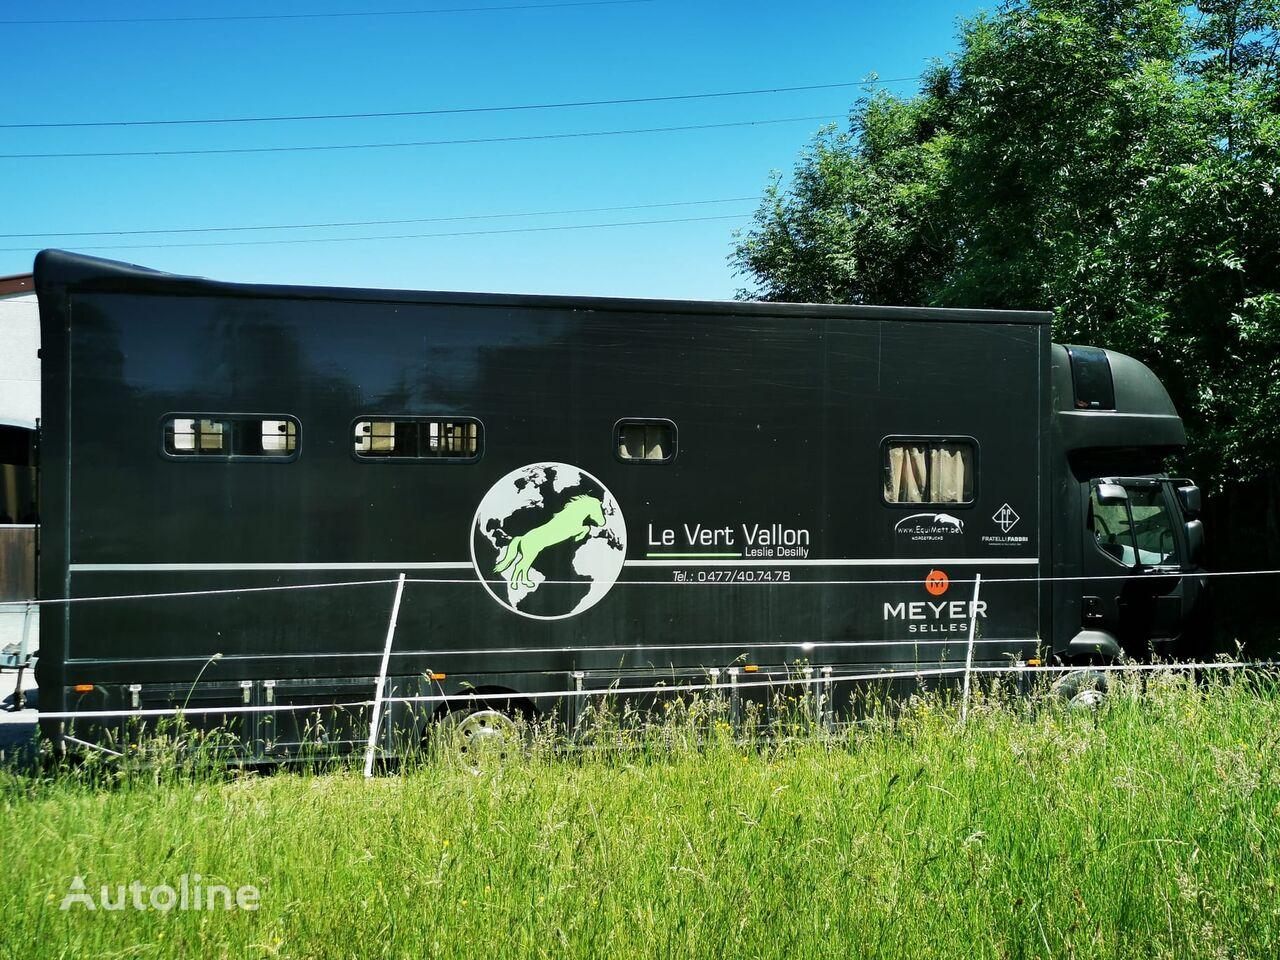 RENAULT Midlum horse transporter